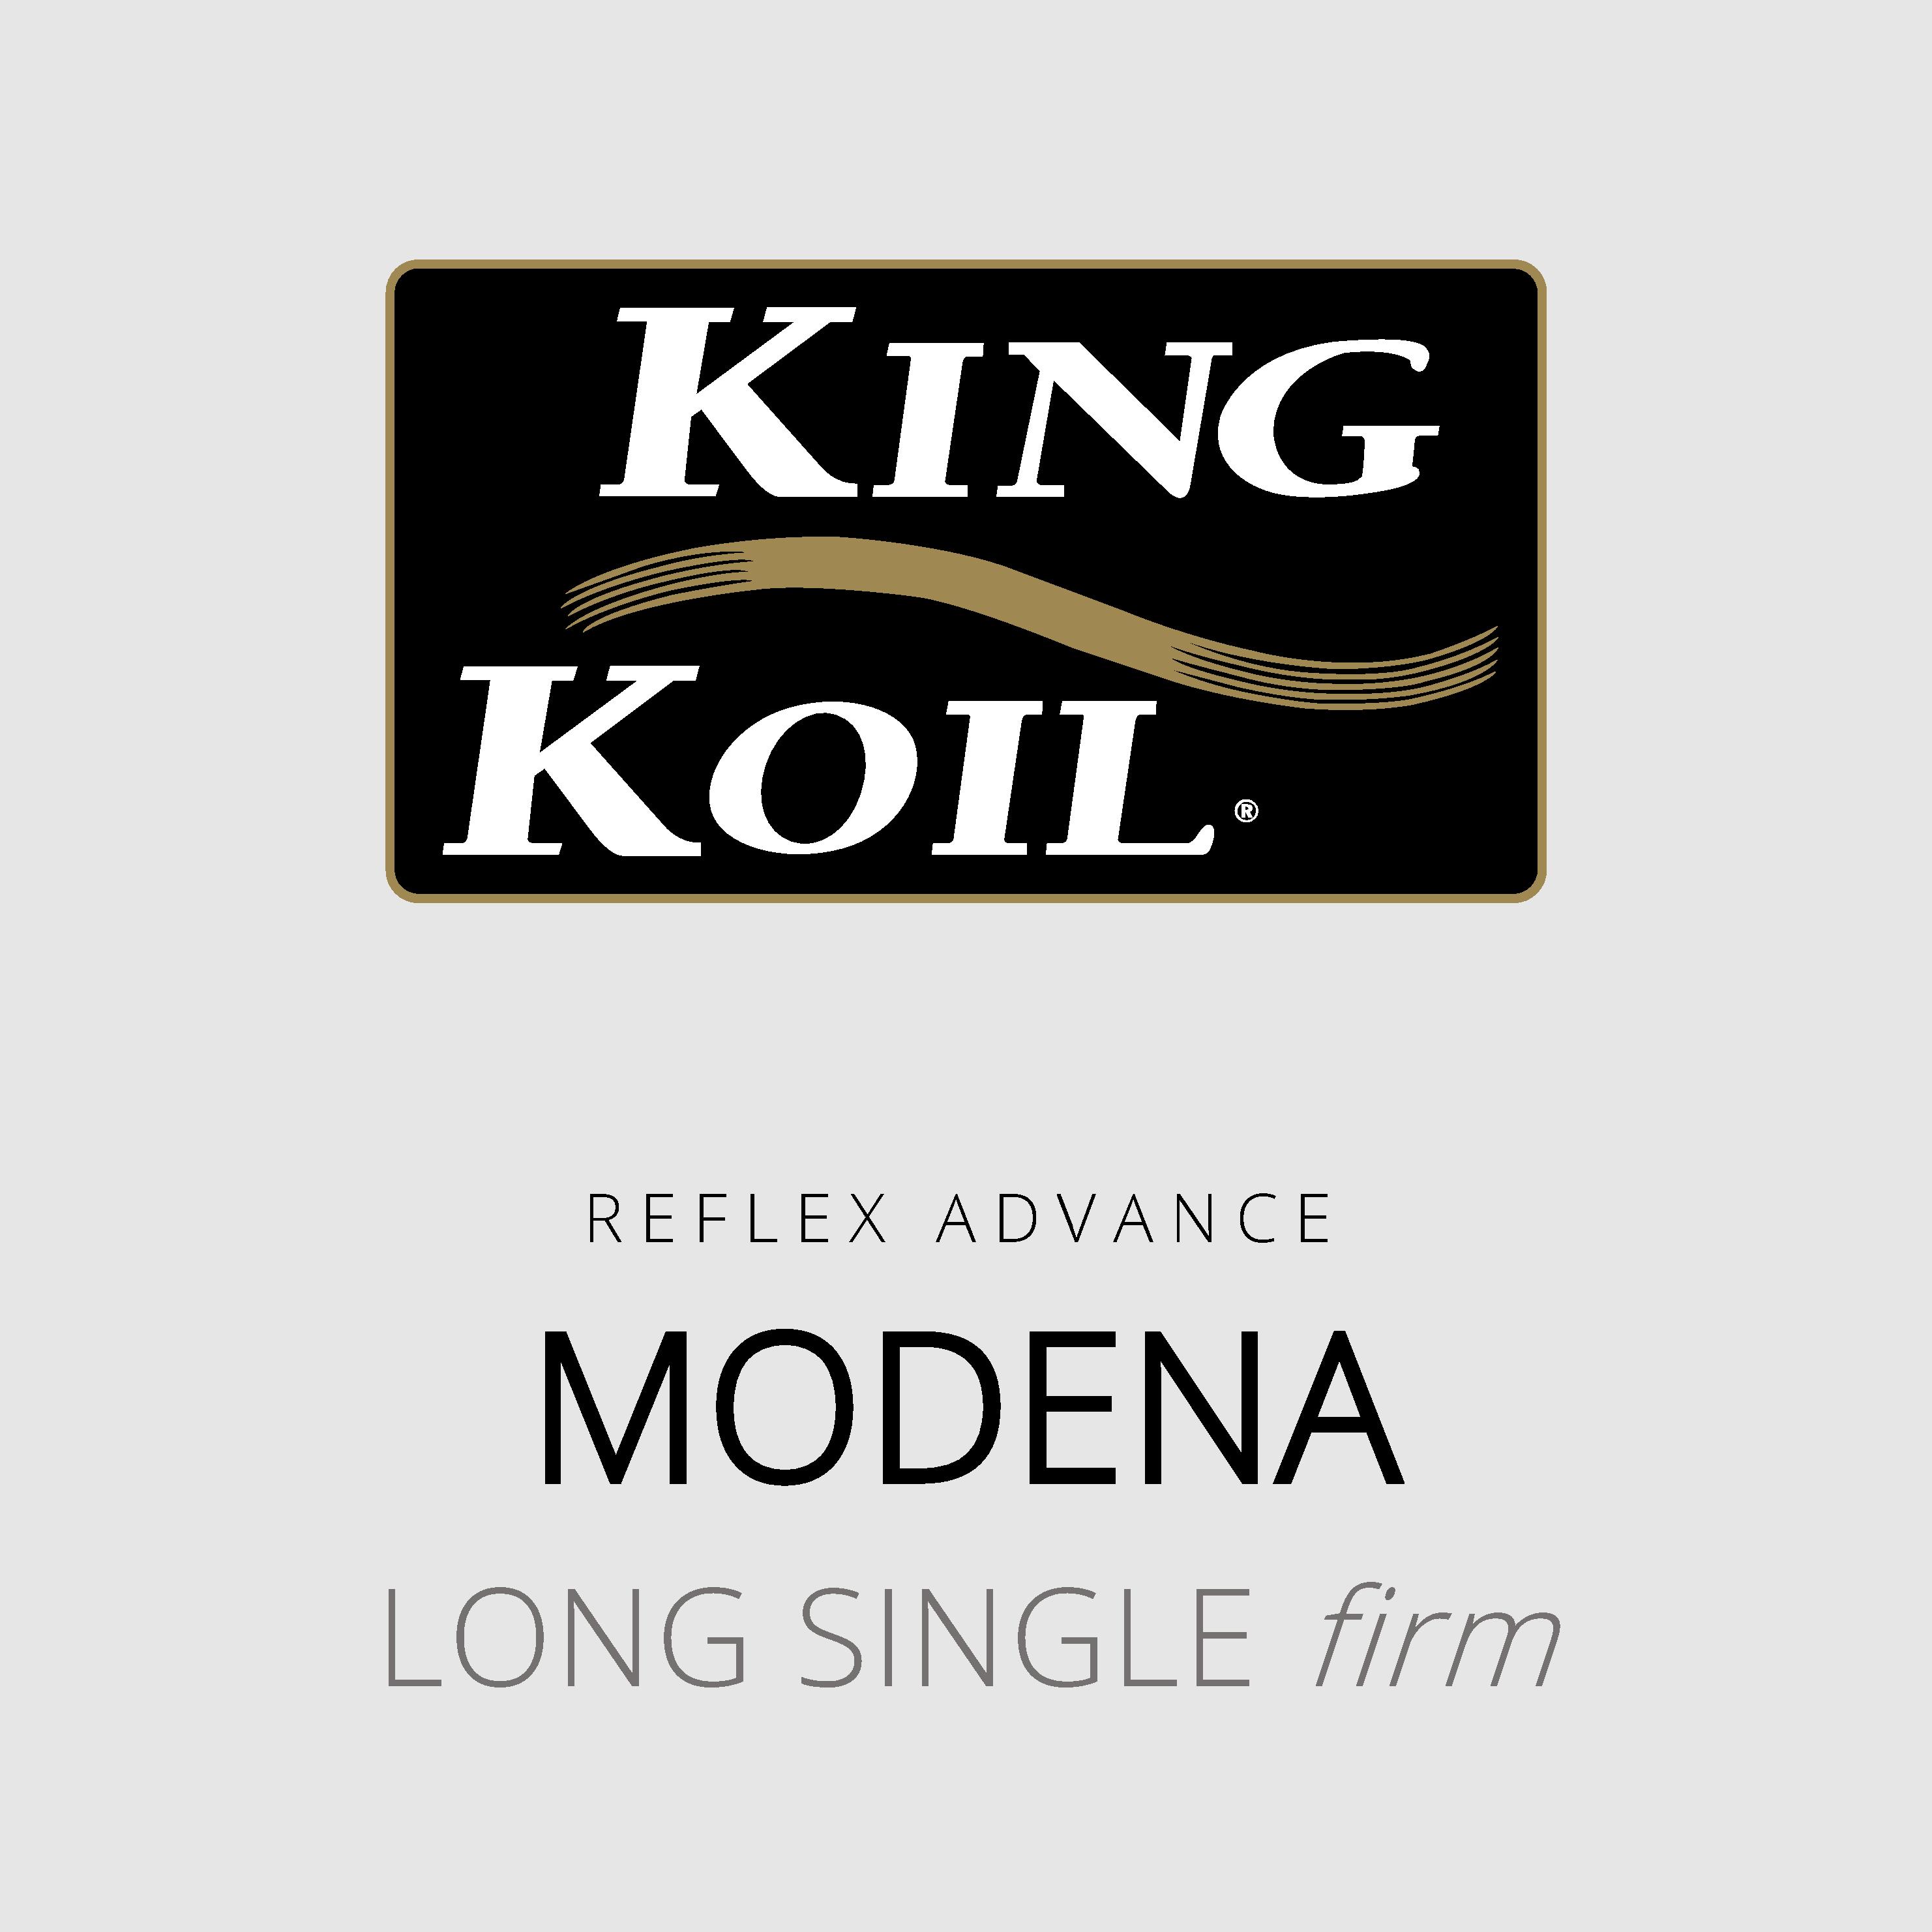 King Koil – Modena – Reflex Advance – Long Single Firm Mattress